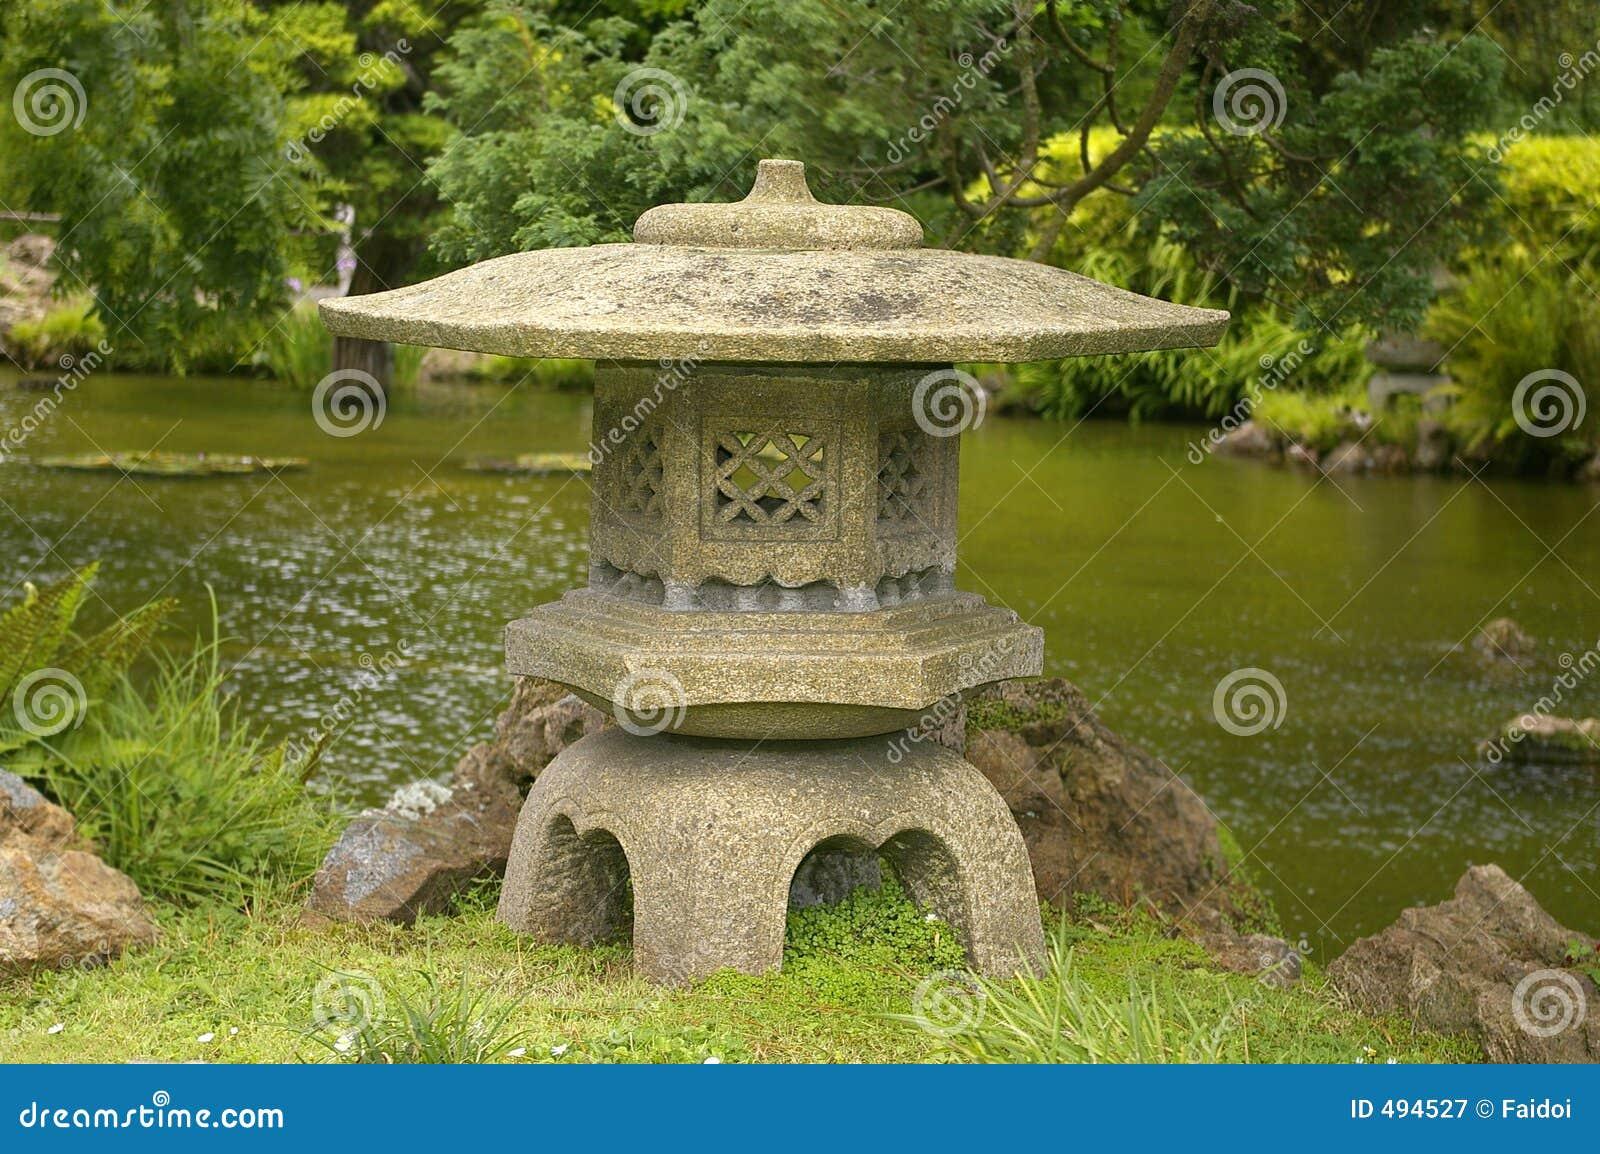 Japanese water garden pink - Japanese Stone Lantern Royalty Free Stock Photography Image 494527